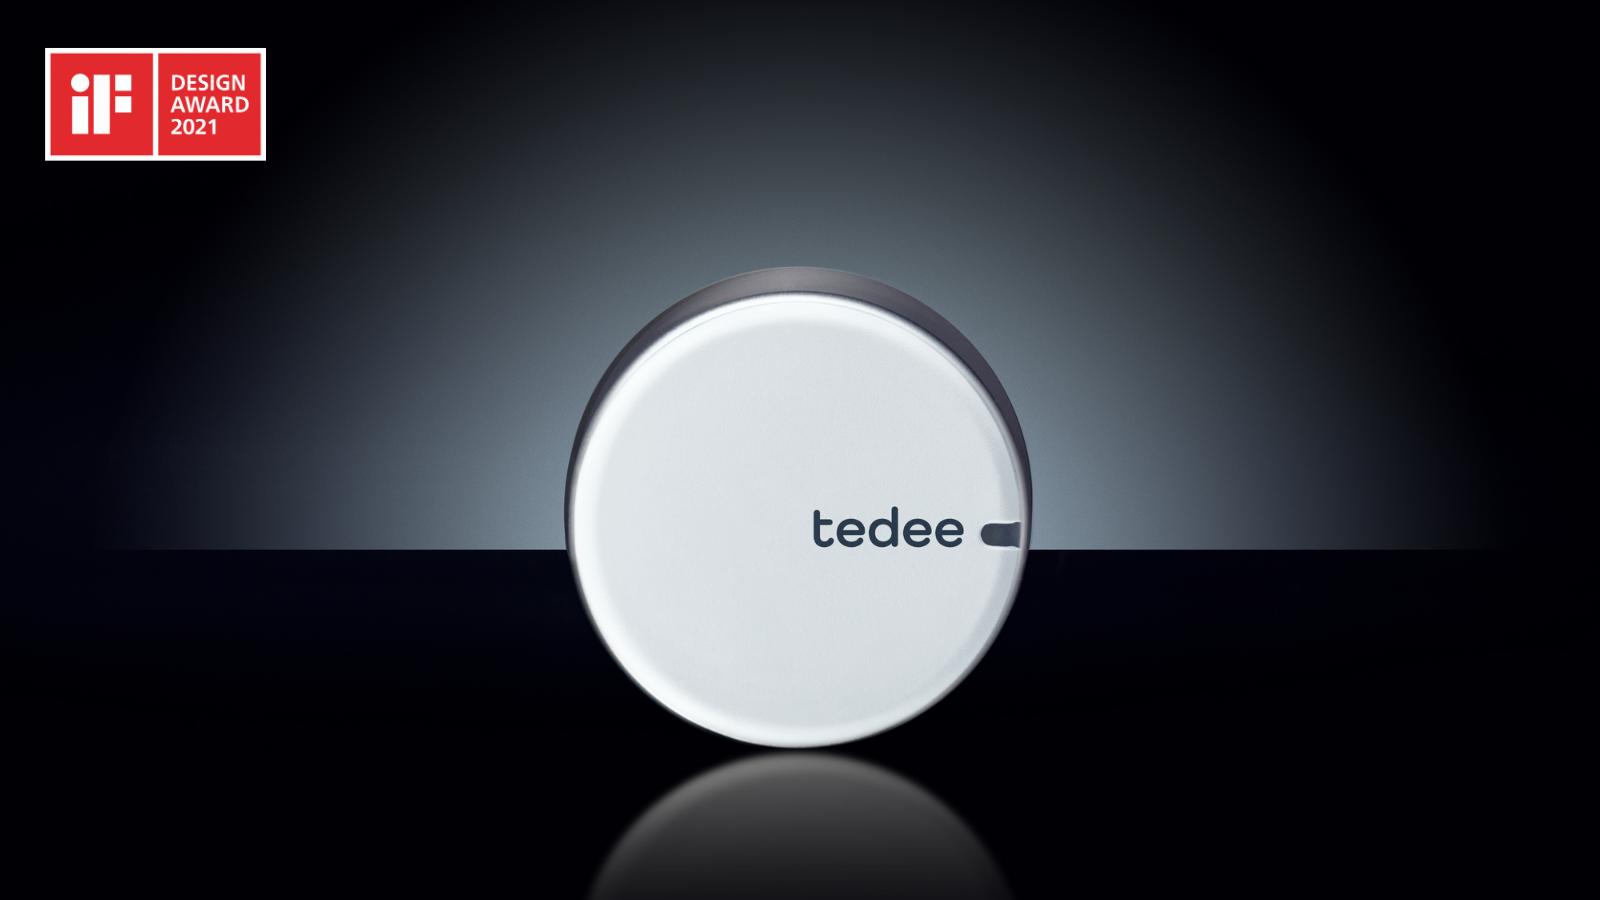 tedee_IF-Design-Award-2021_2